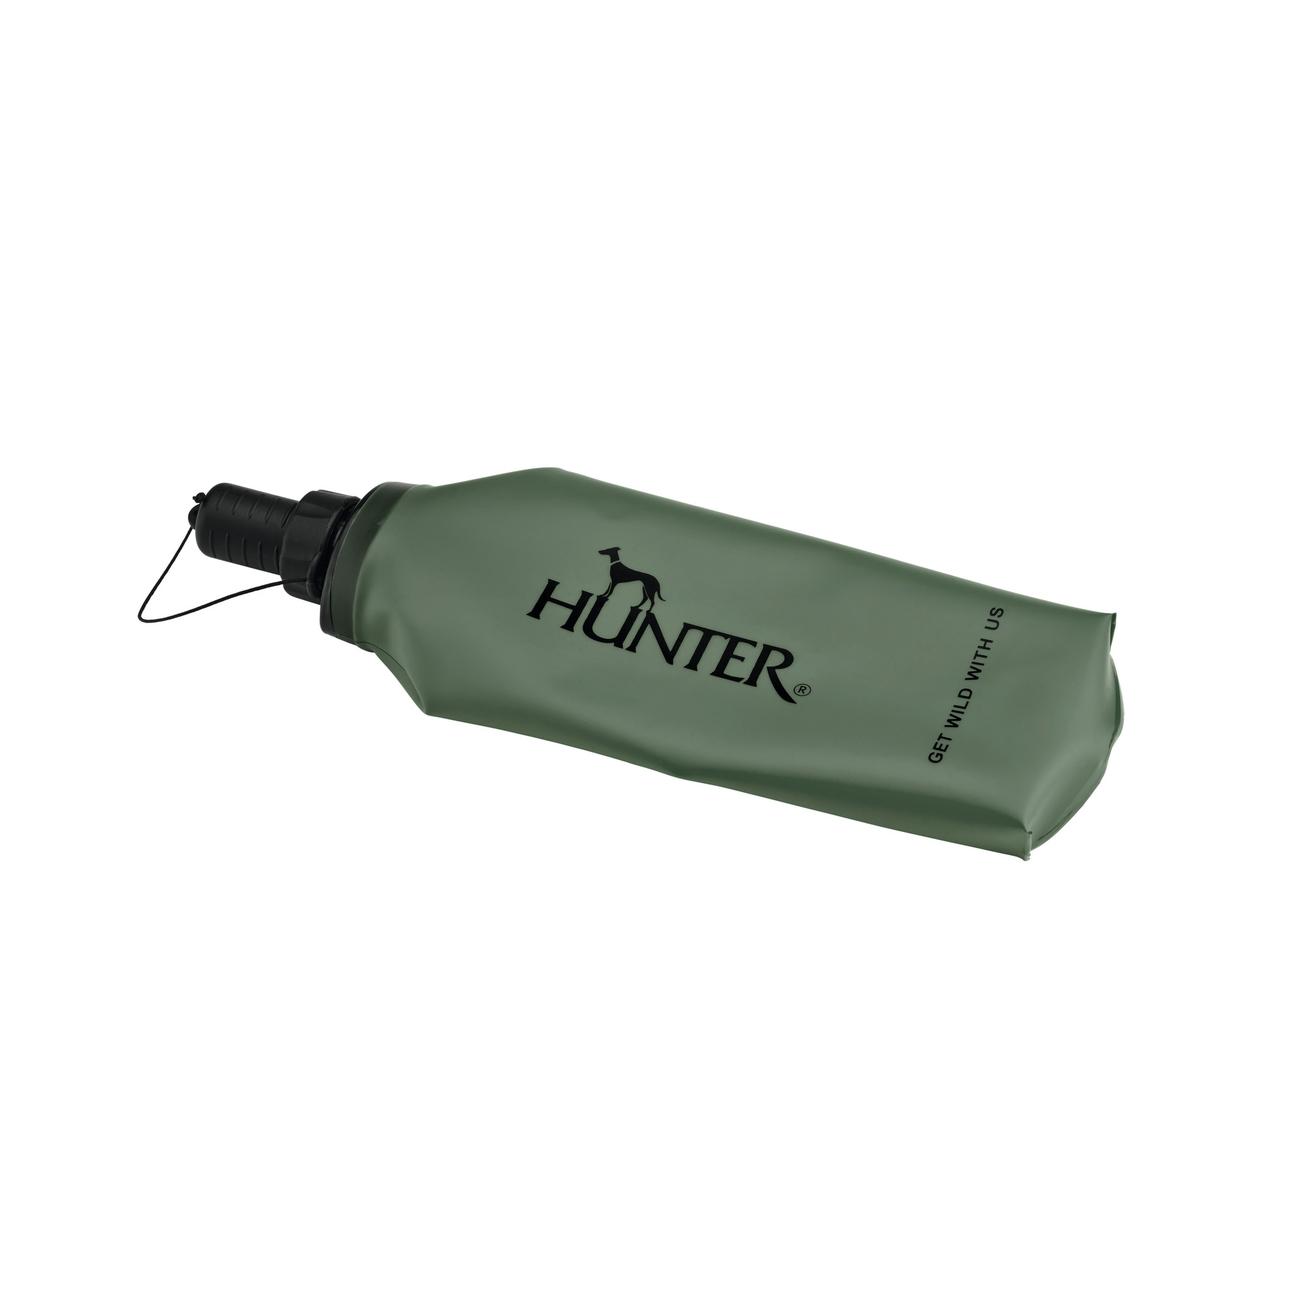 Hunter Outdoor Hunde Trinkflasche Yate 66804